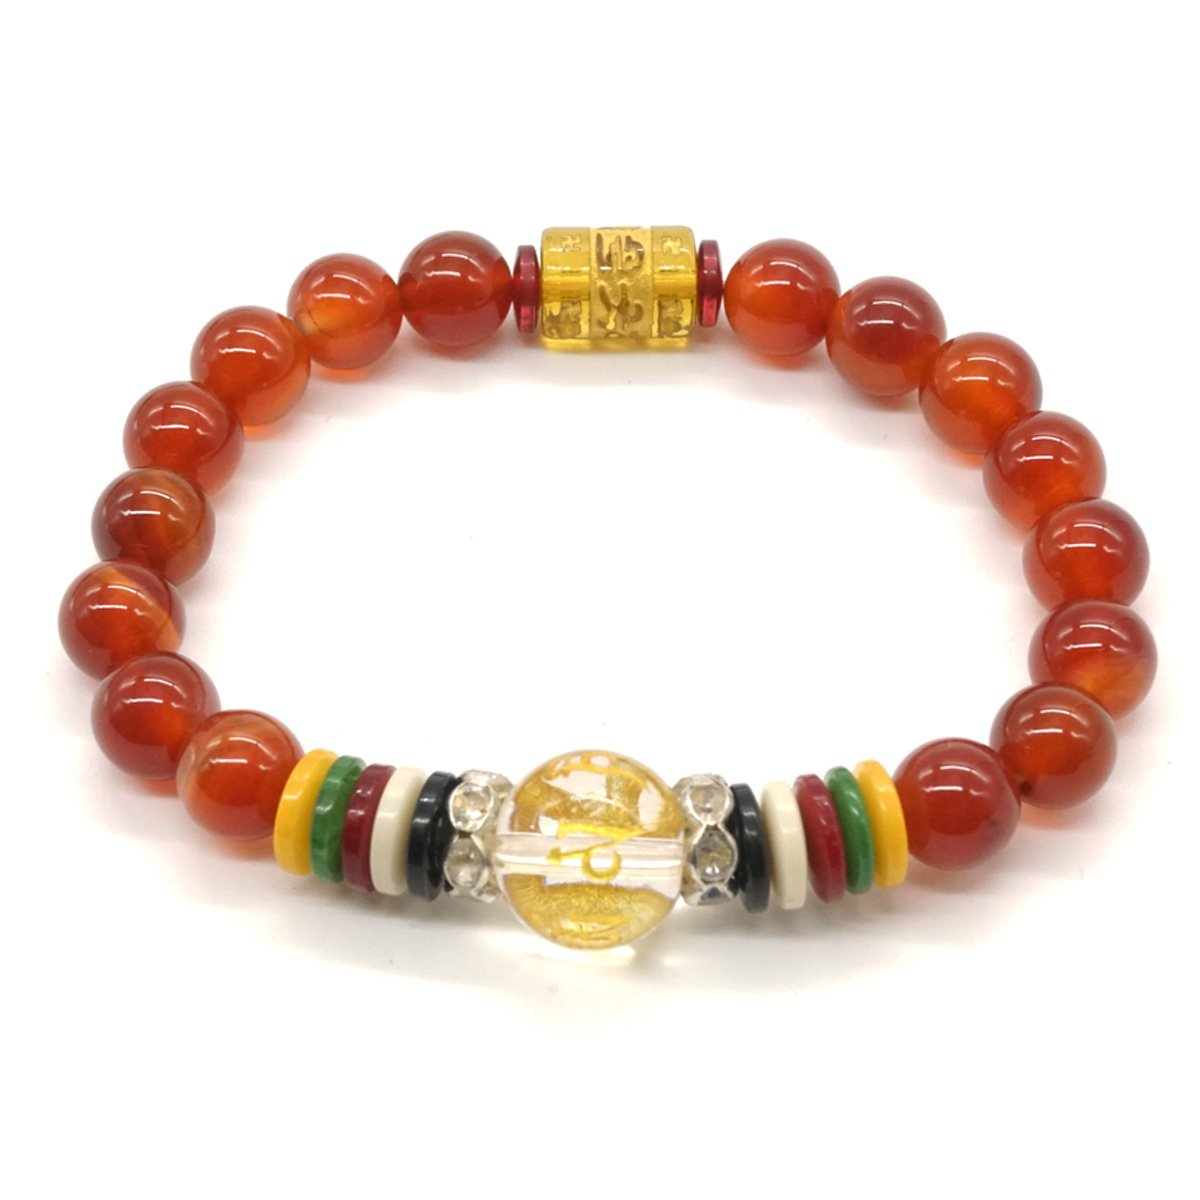 Bracelet en Agate Rouge Yoga Tib/étain Pray Mala Beads Pierre Naturelle Bracelet Bouddhiste en Pierre Chakra